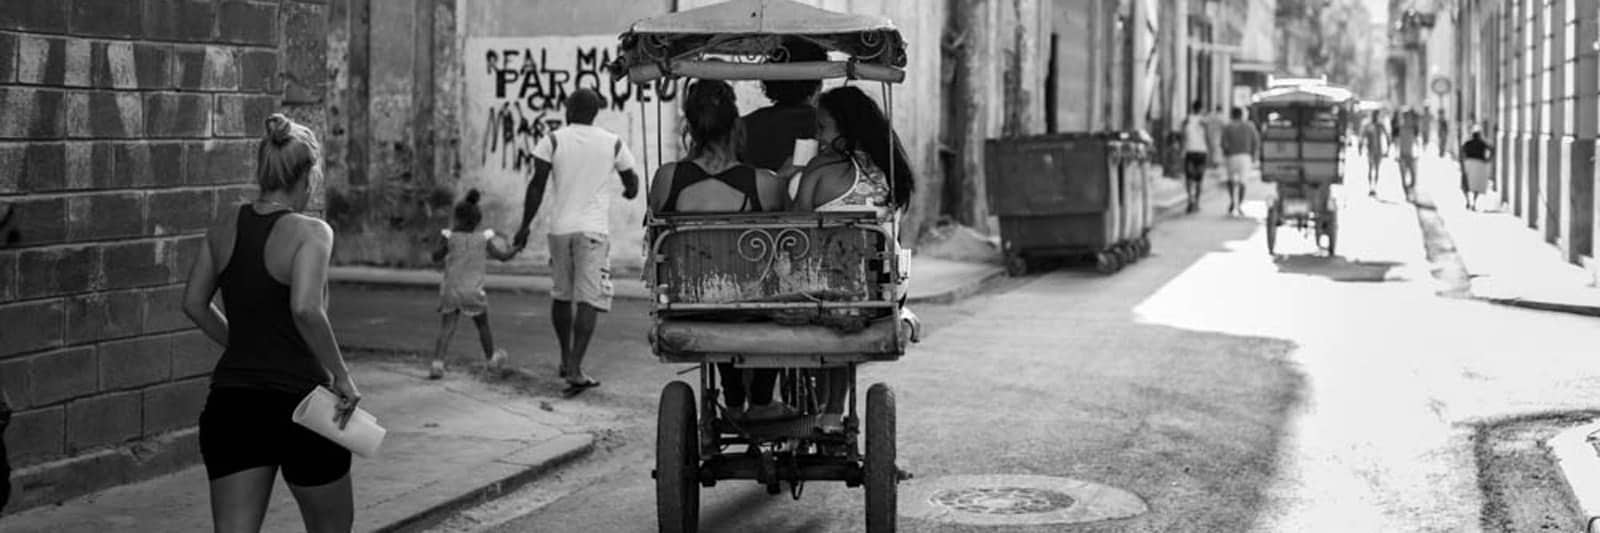 Cuba Photography: A Street View